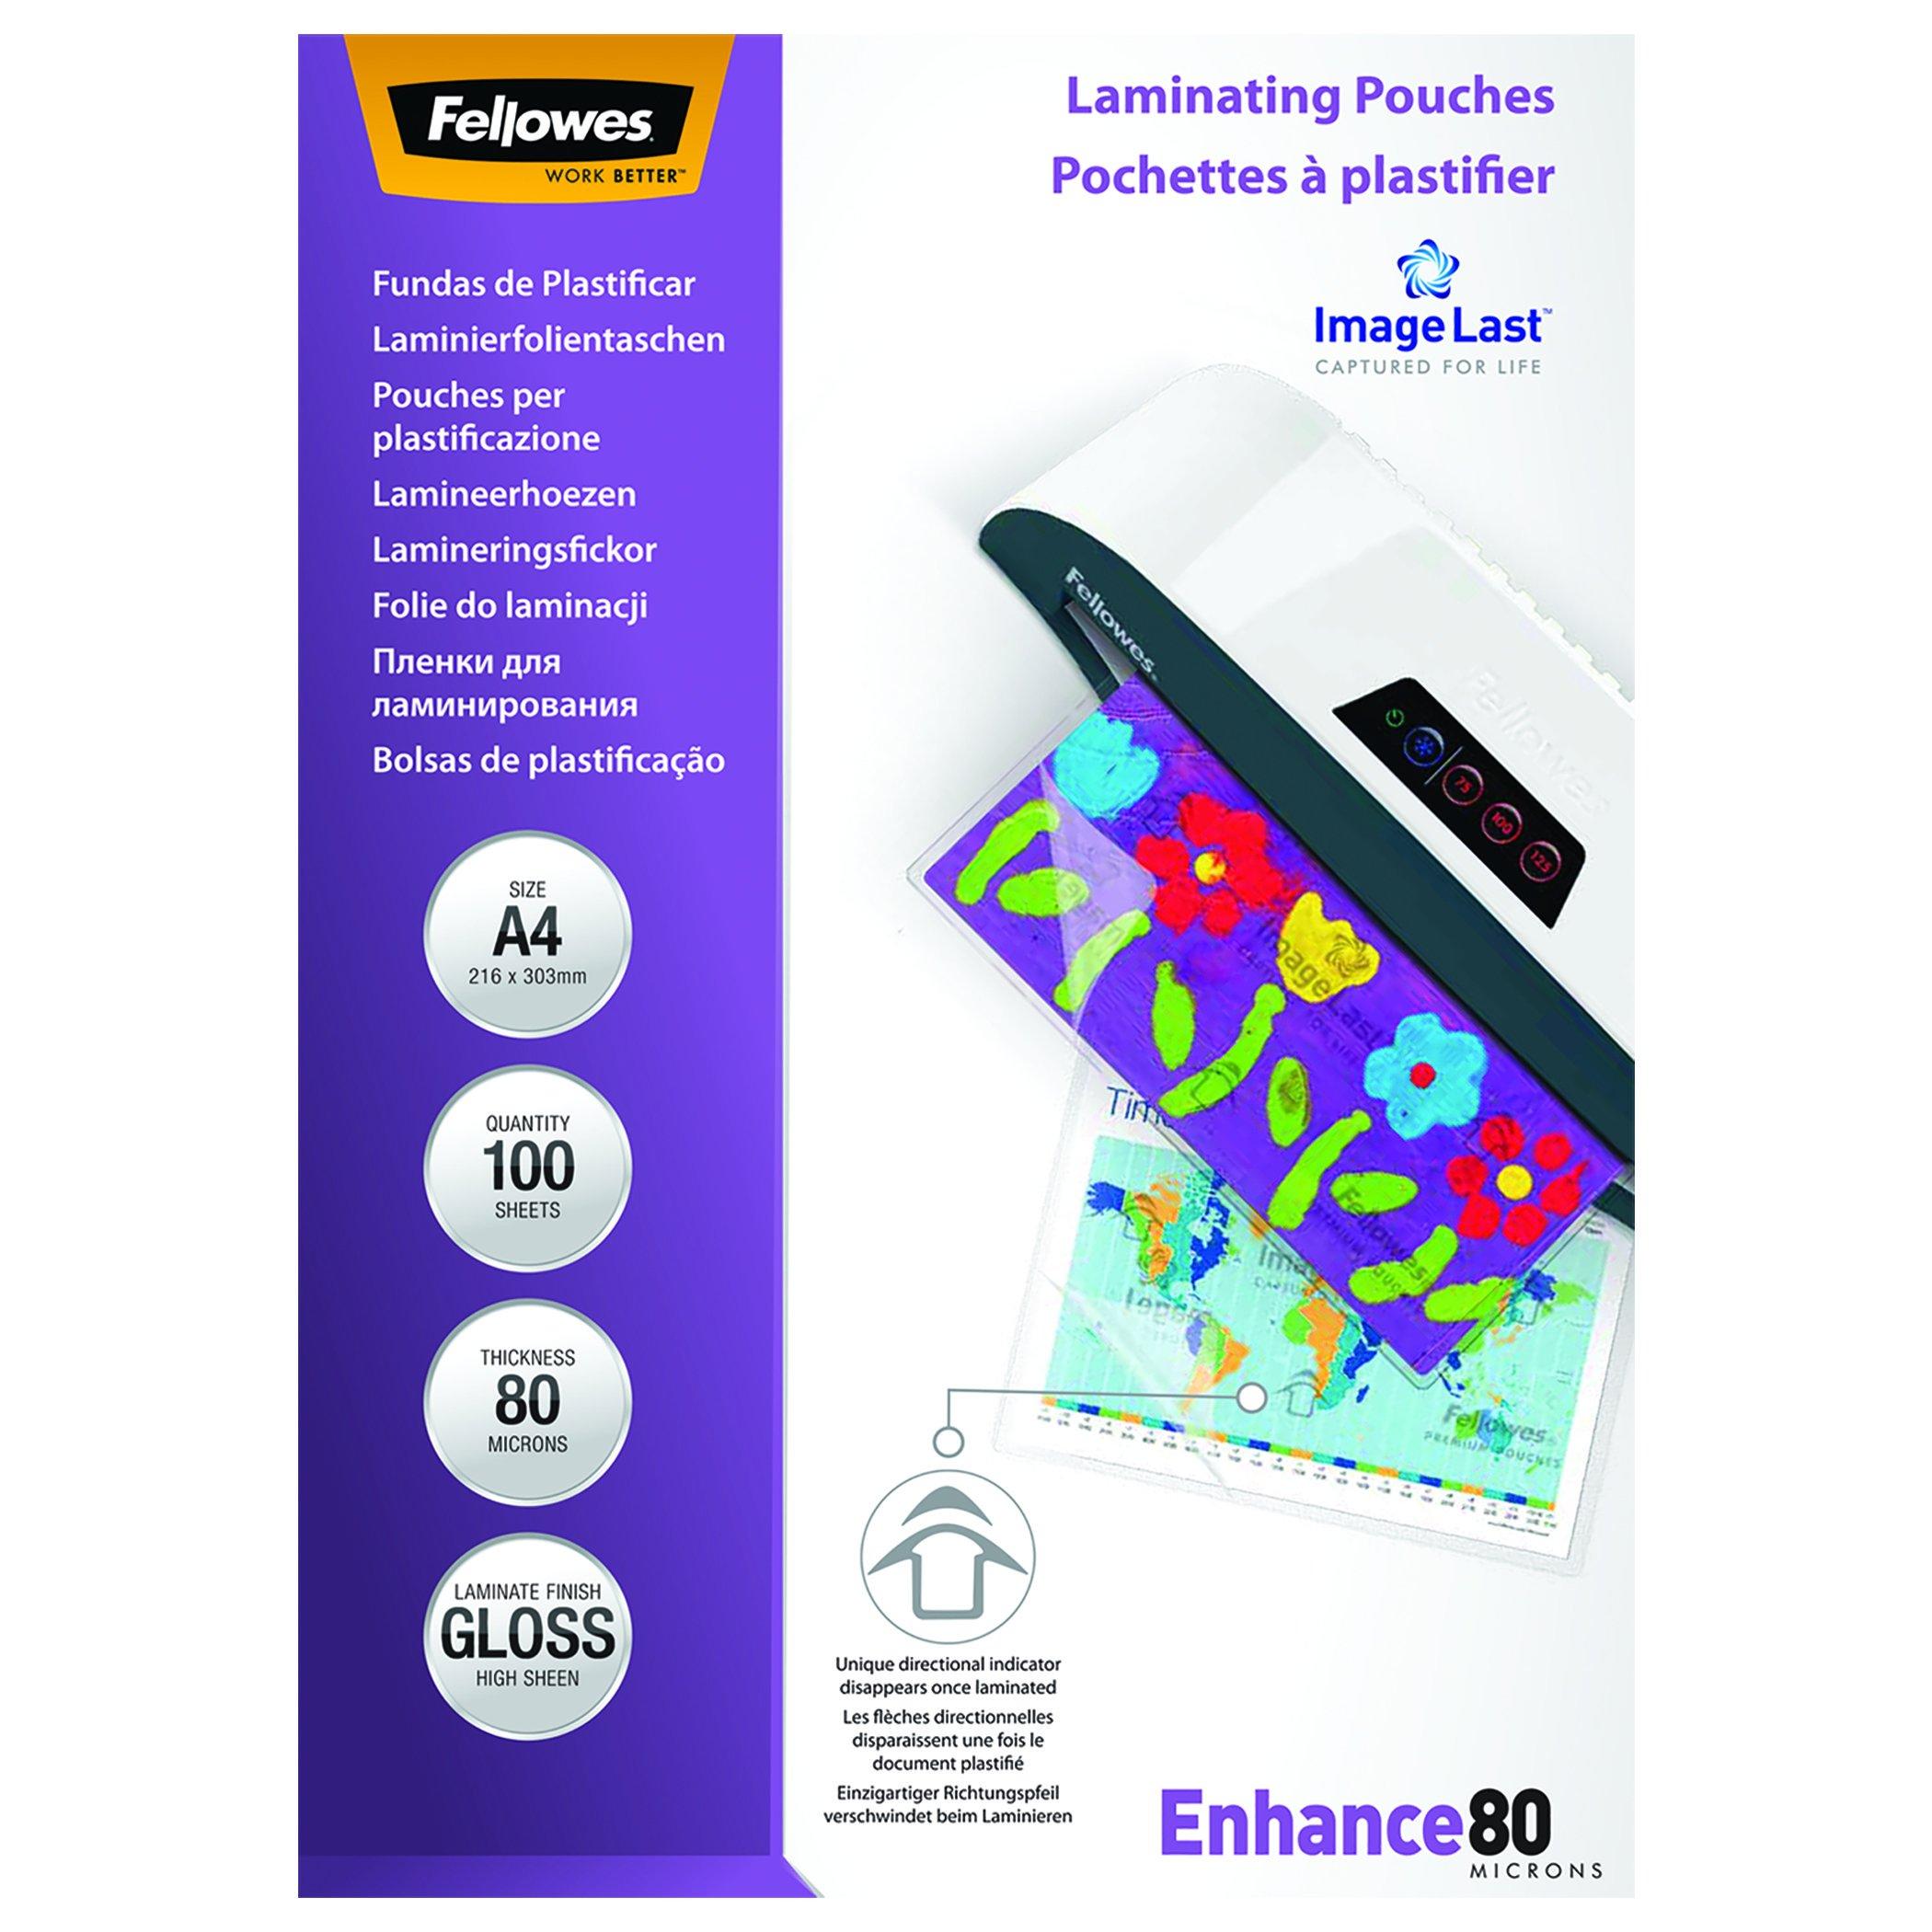 Fellowes 53061 - Pack de 100 fundas para plastificar, brillo, formato A4, 80